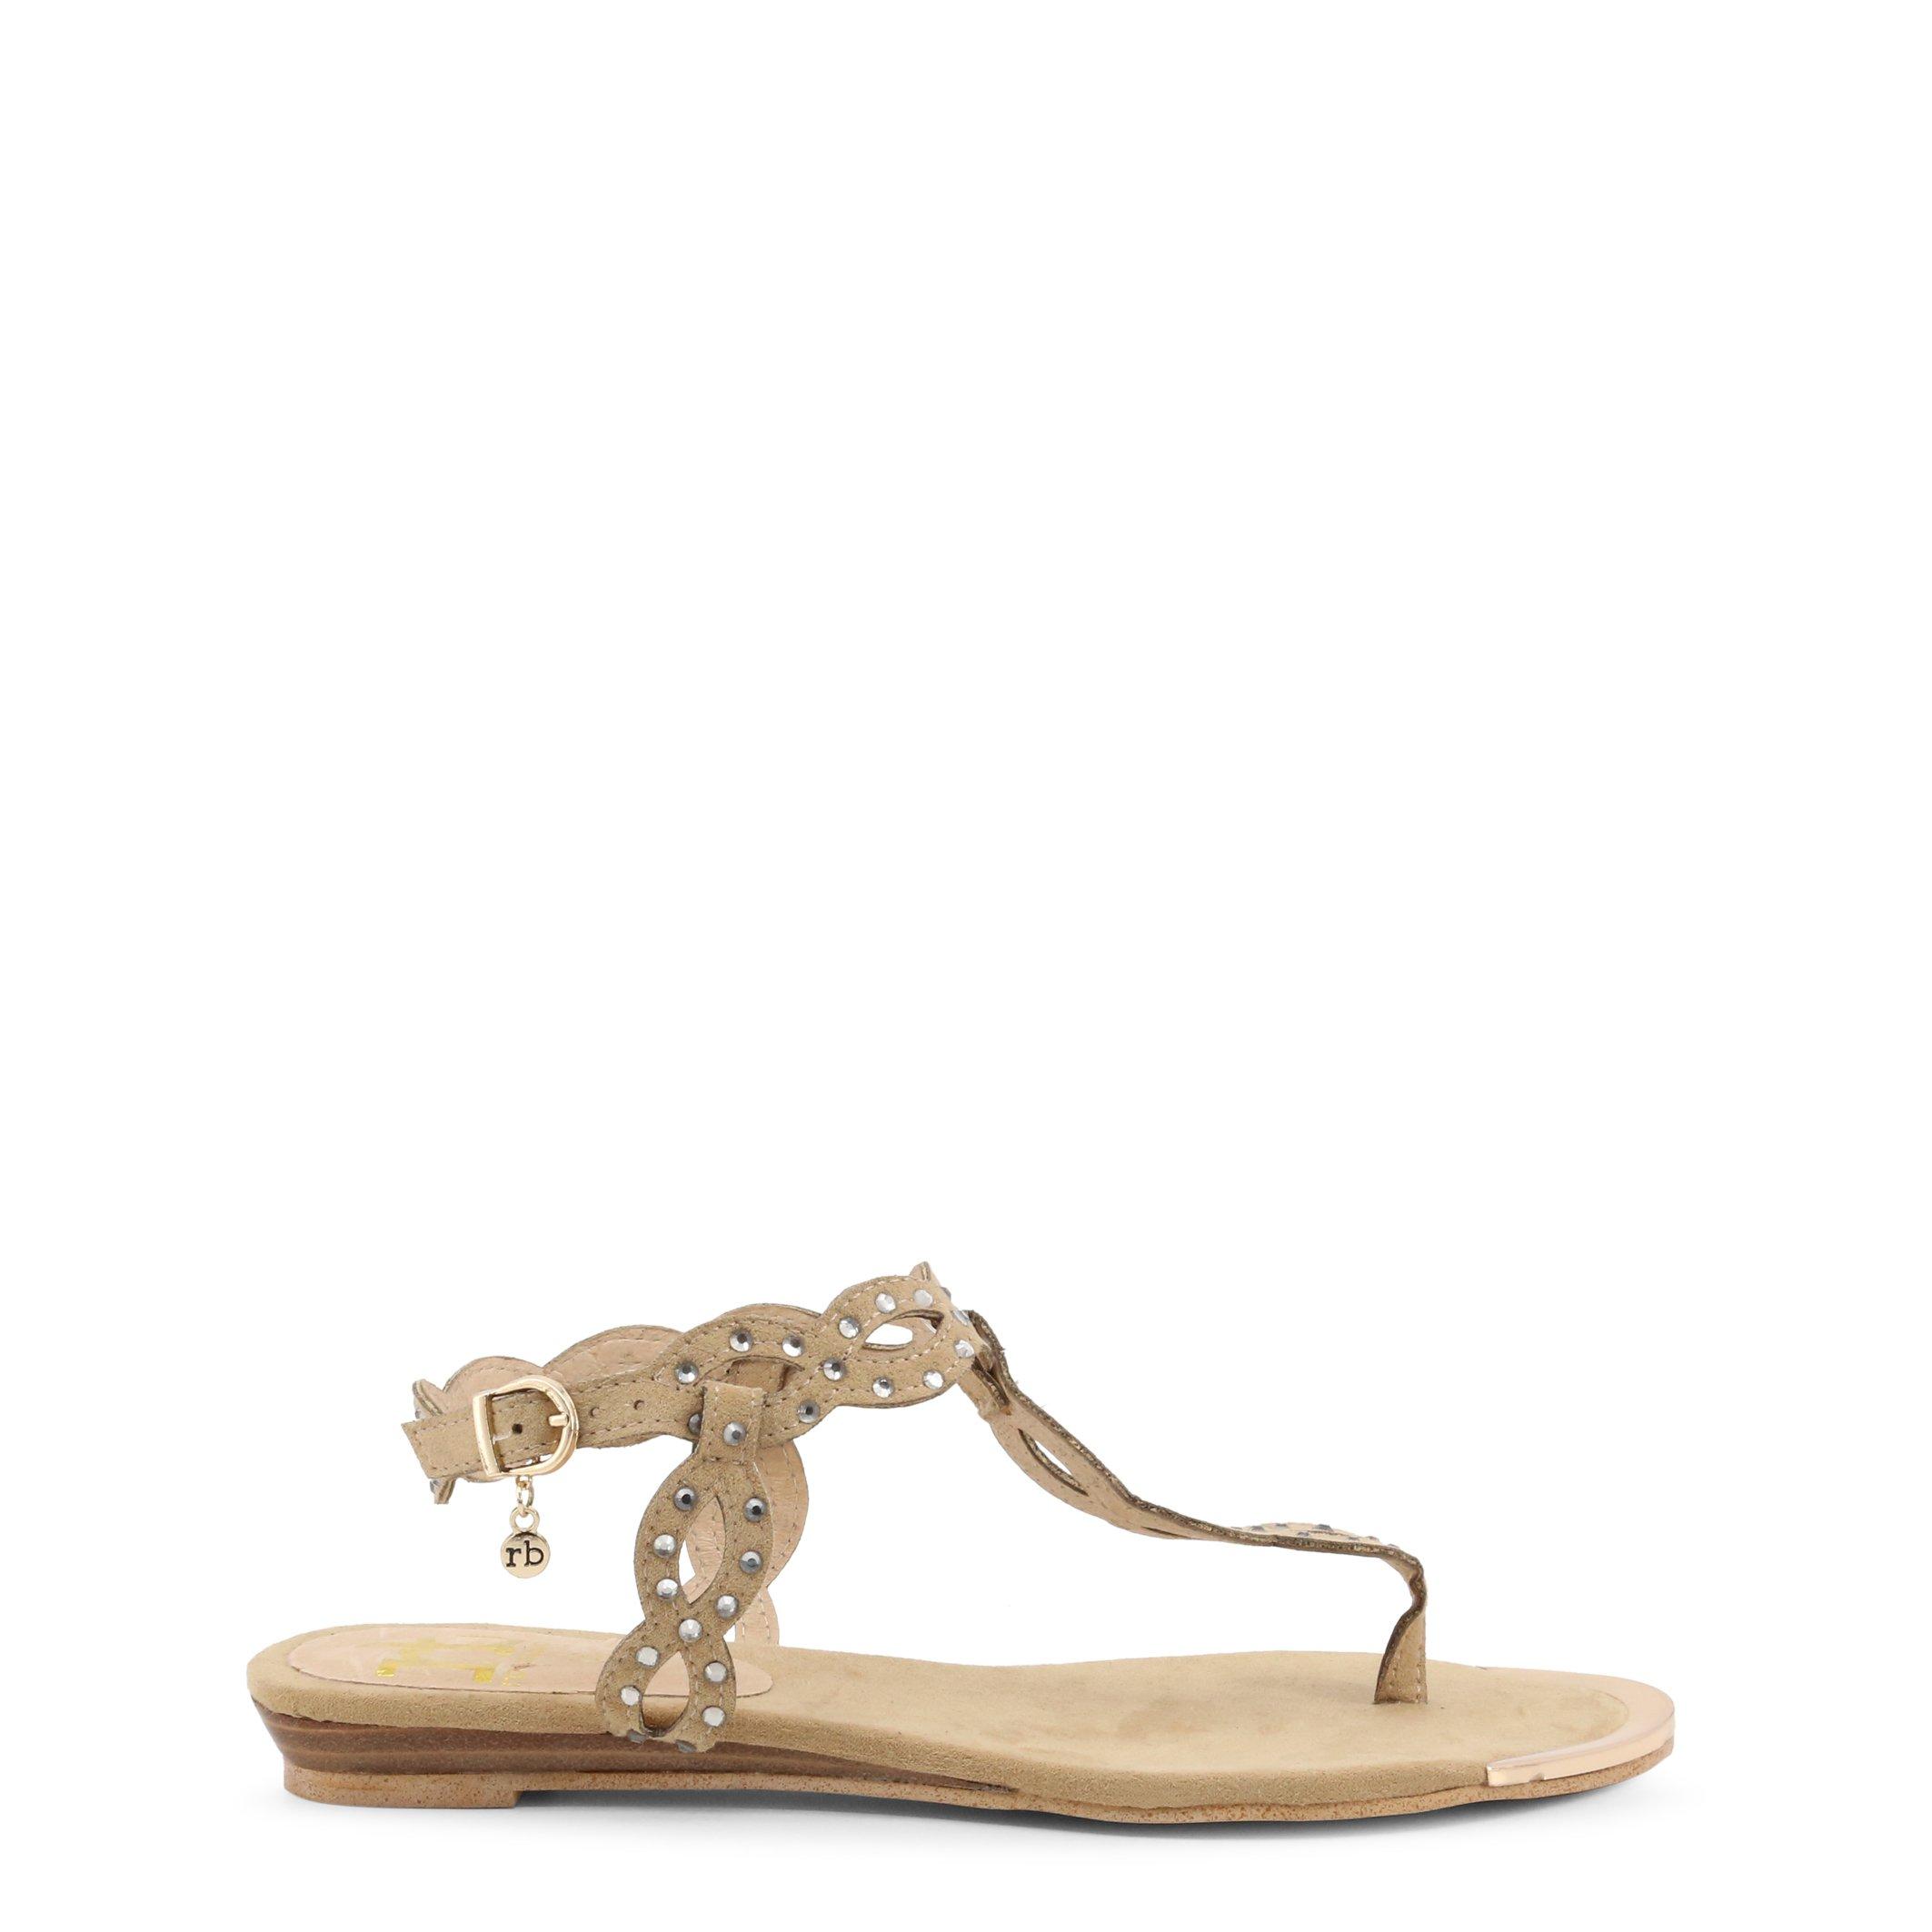 Roccobarocco Women's Sandal Black RBSC0M403CAM - brown EU 35